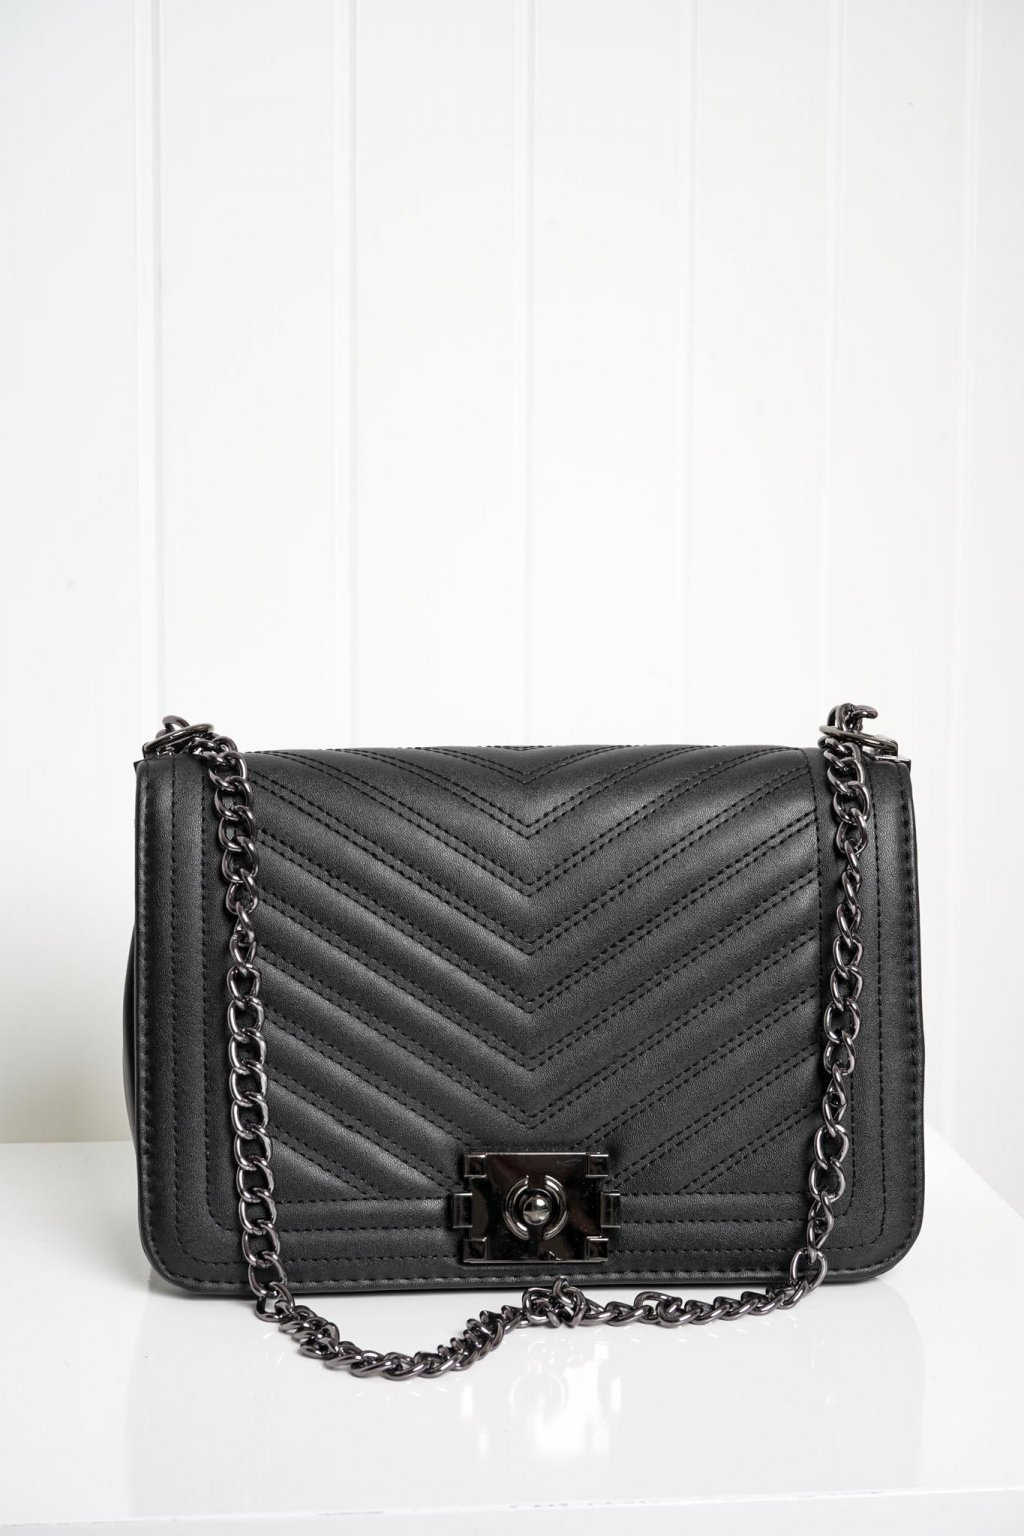 Kabelka, crossbody, ruksak, shopping bag, shopperka, 050